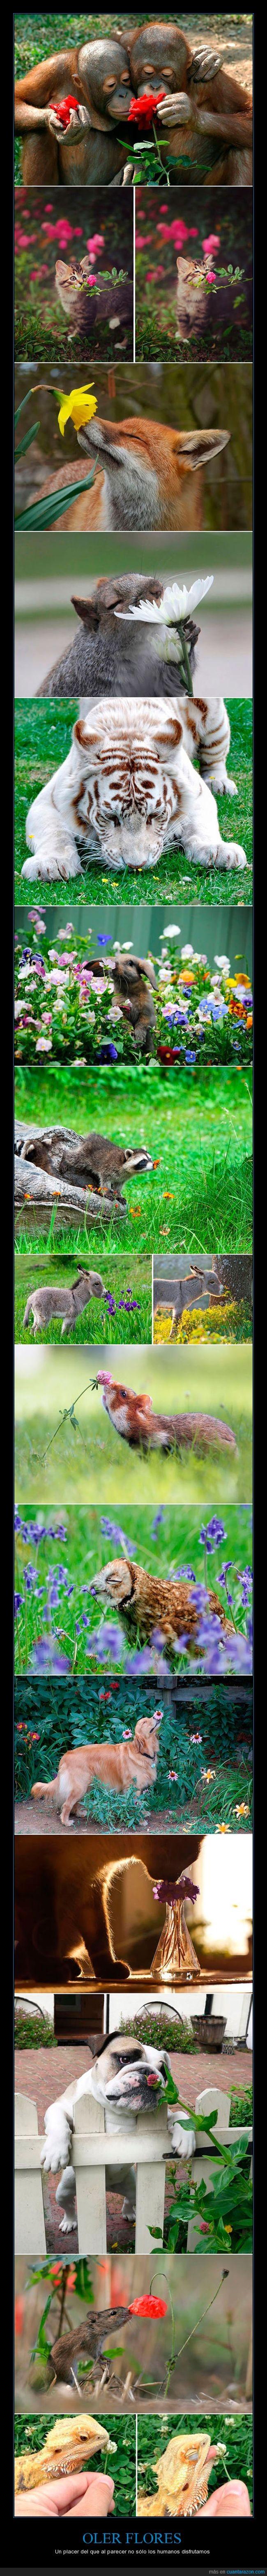 animal,flores,gato,mapache,oler,olfato,perro,raton,tigre